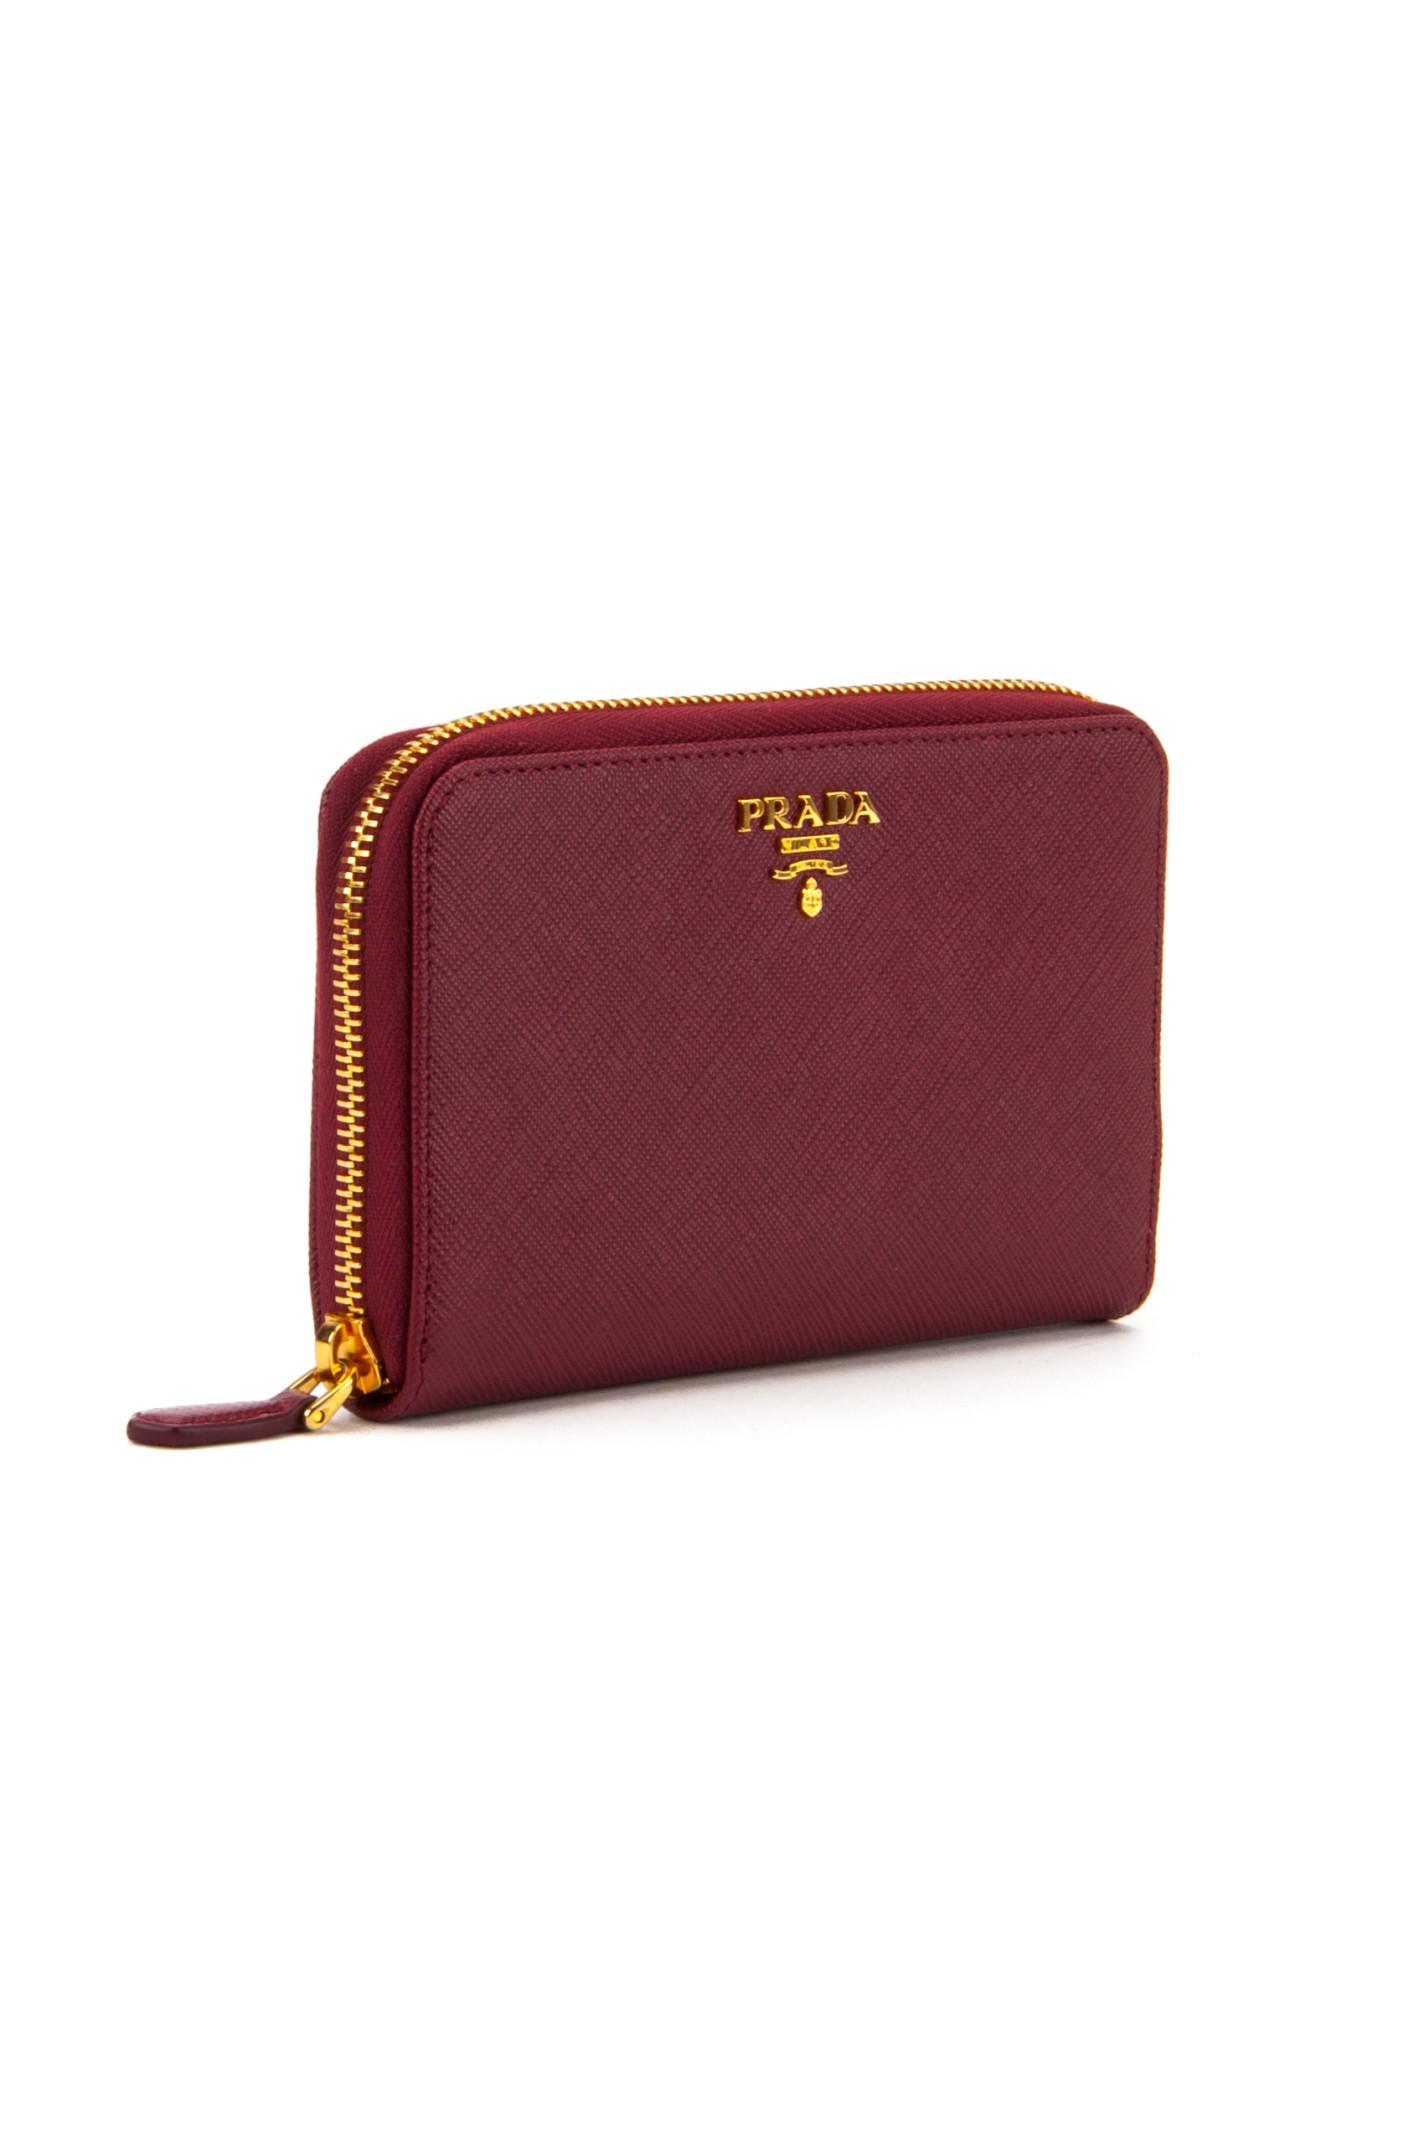 prada bags cheap - Prada Saffiano Wallet in Purple (CERISE) | Lyst